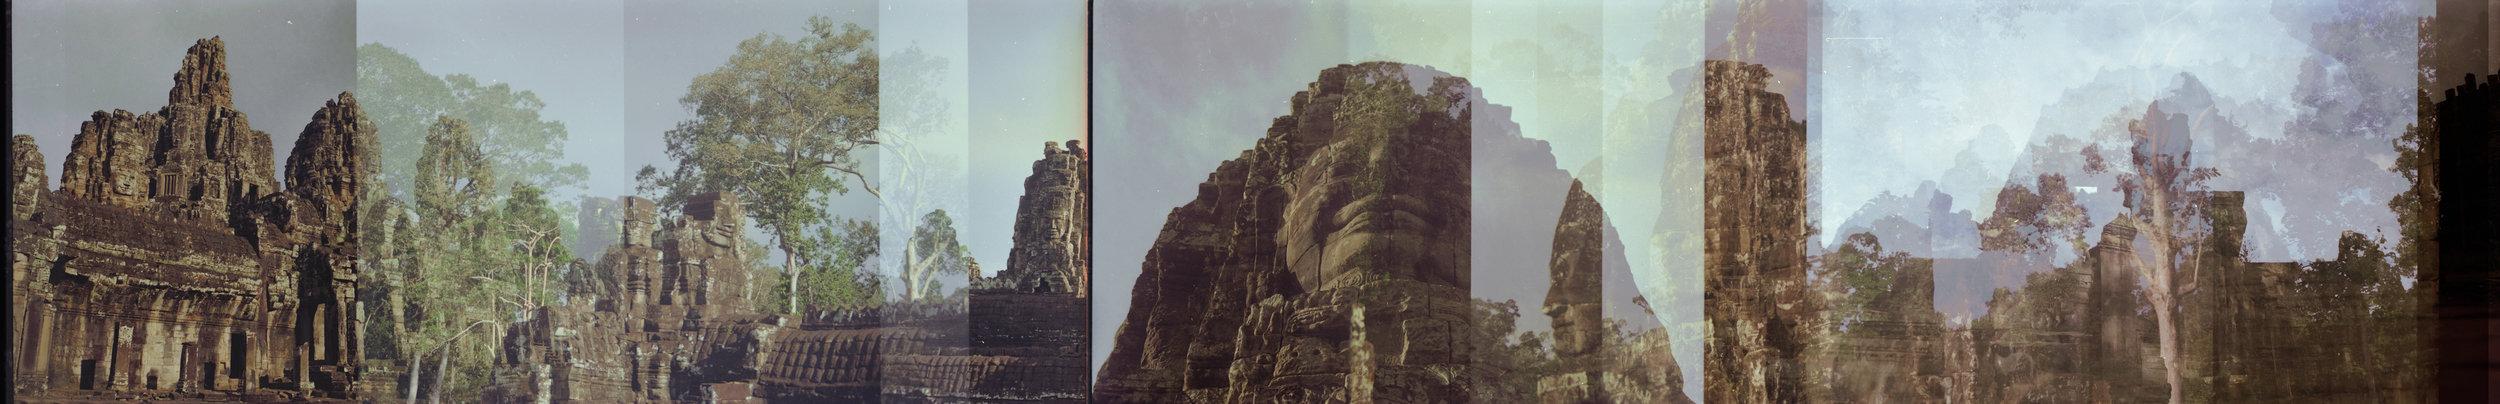 BAYON-ARTWORK-COLLECTION-PHOTOGRAPHY.jpg